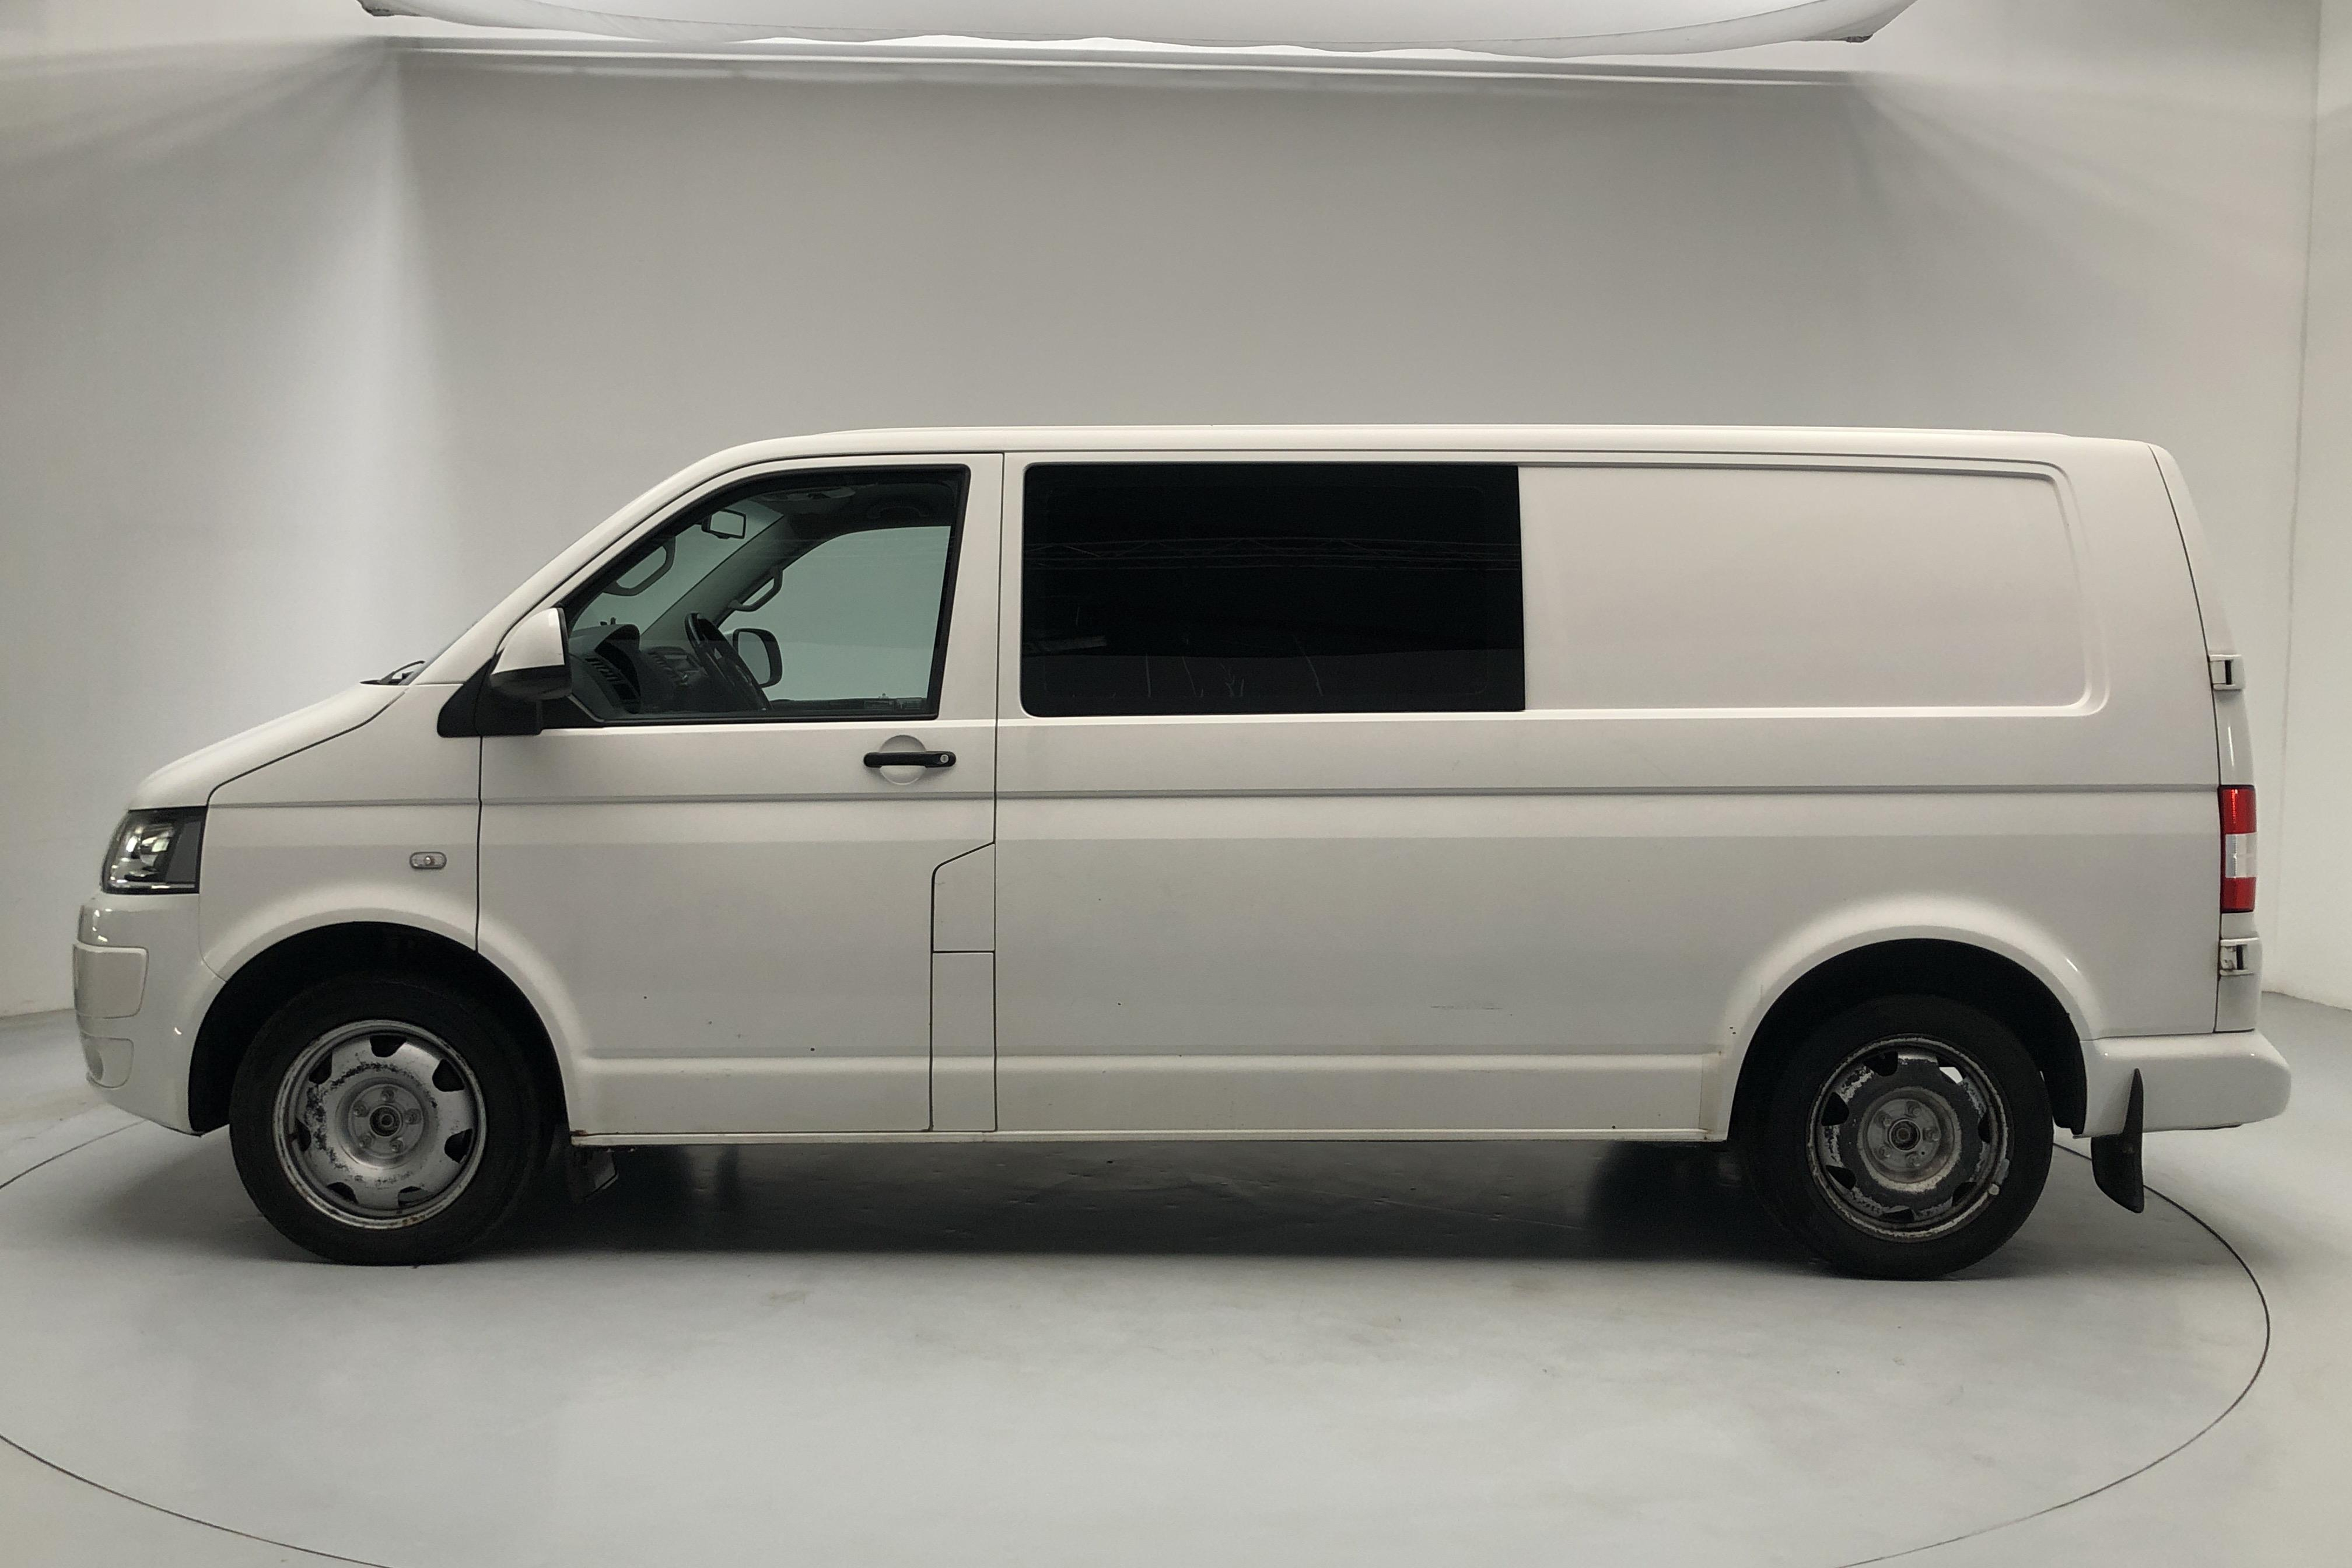 VW Transporter Kombi T5 2.0 TDI 4MOTION (180hk) - 0 km - Automatic - white - 2013